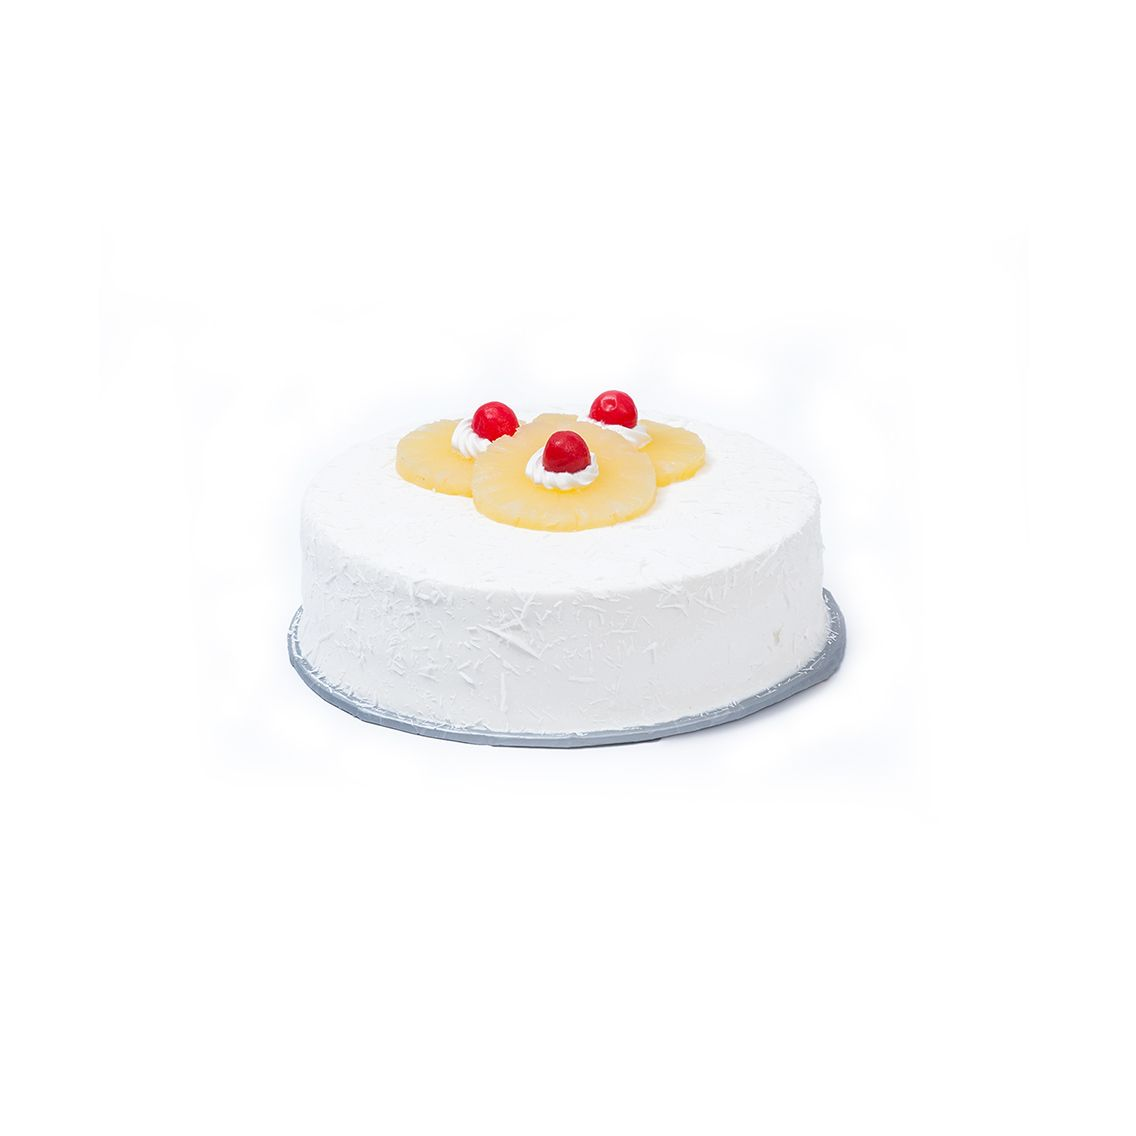 Kitchen Cuisine Default Category Pineapple Sponge Cream Cake